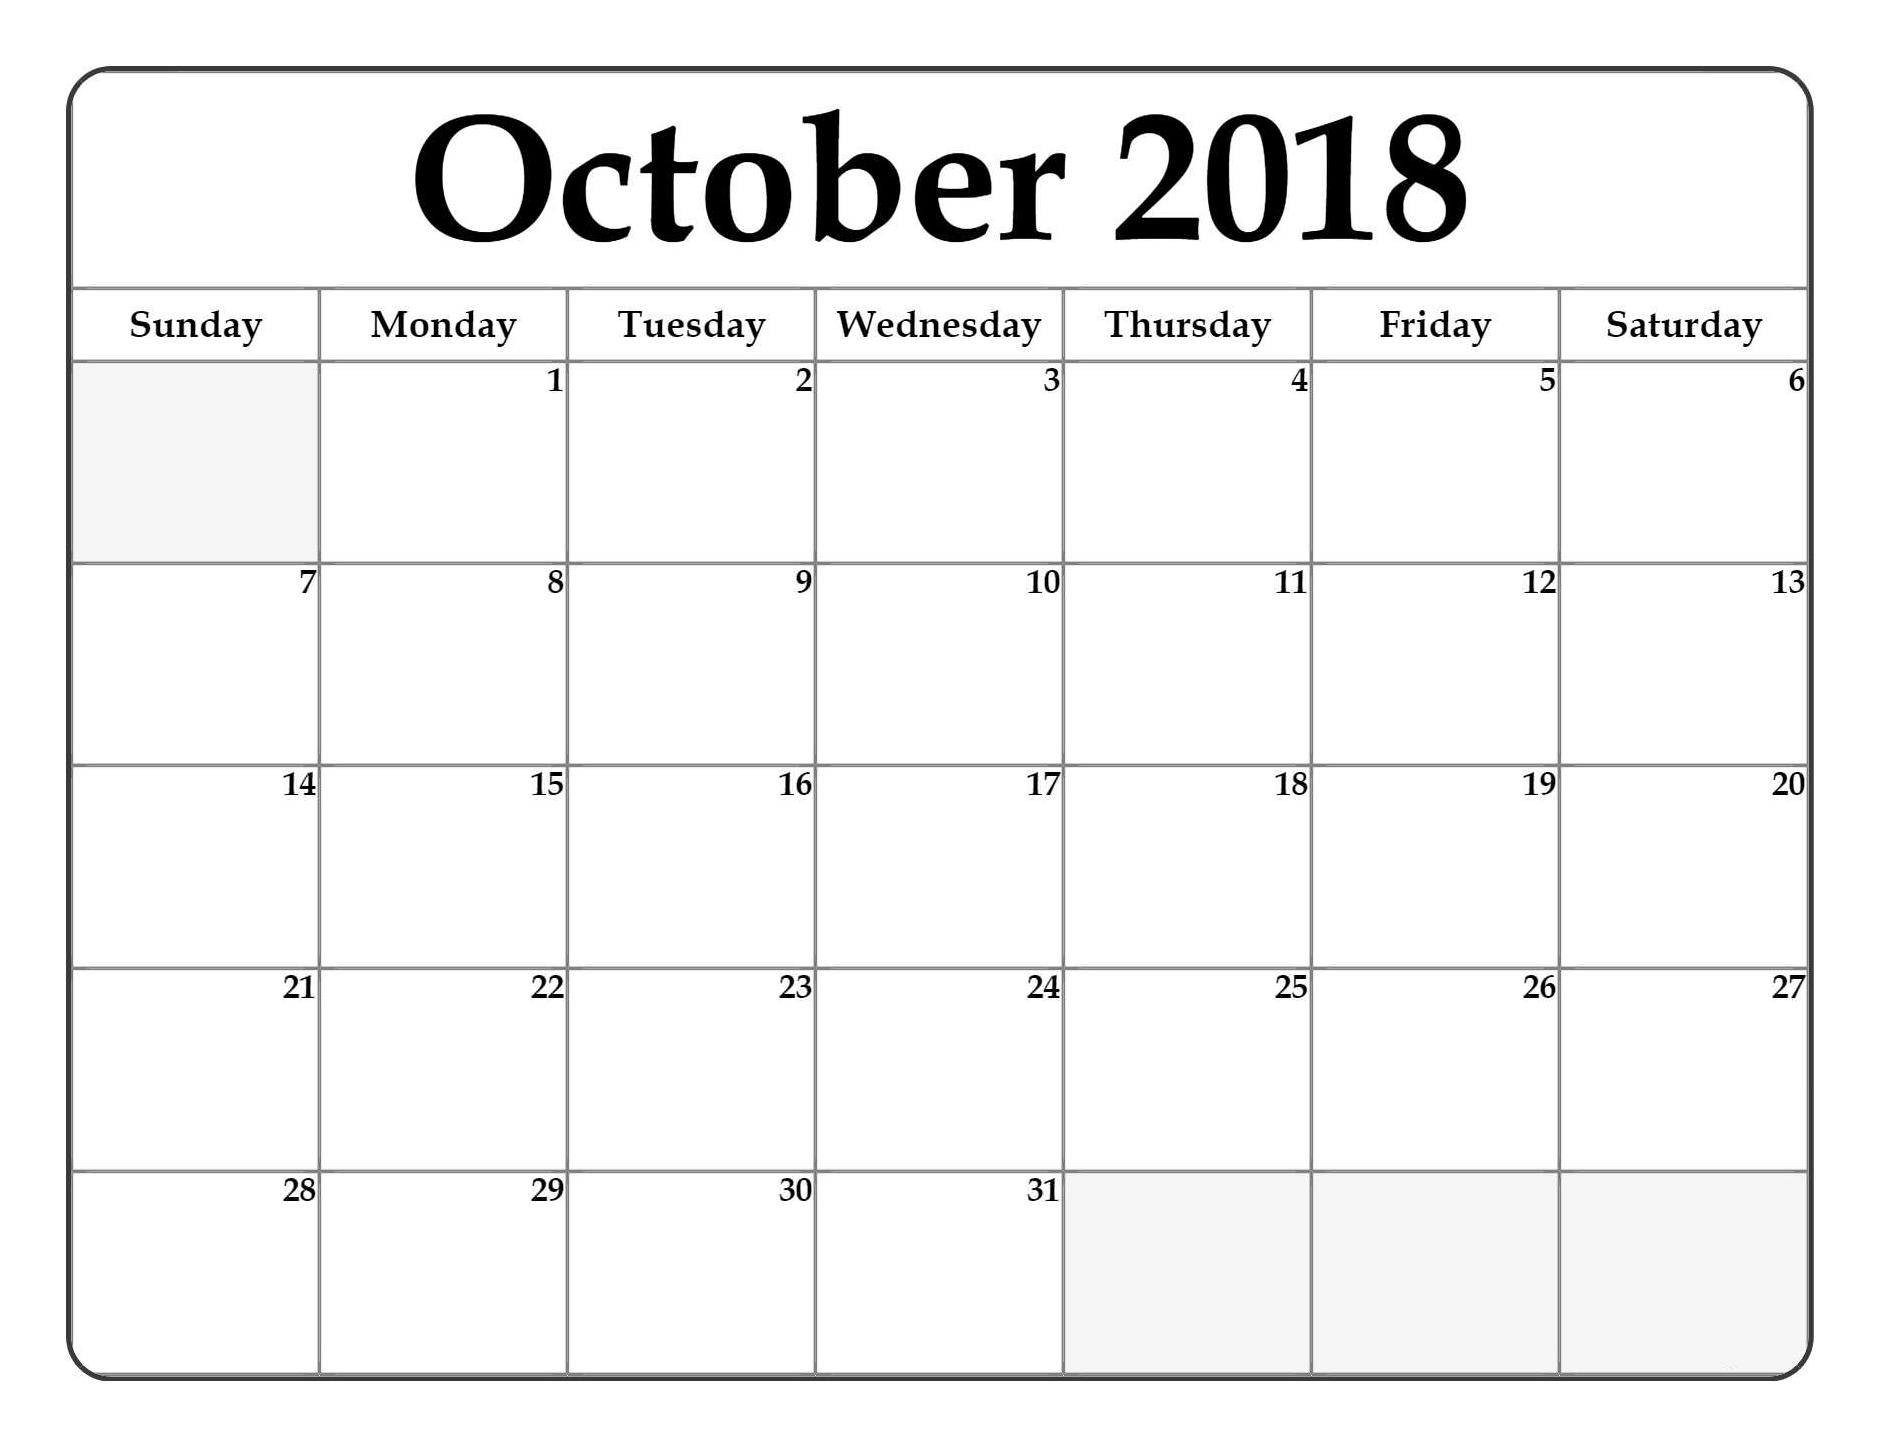 blank october 2018 calendar printable free printable calendar Printable October 2018 Calendar erdferdf